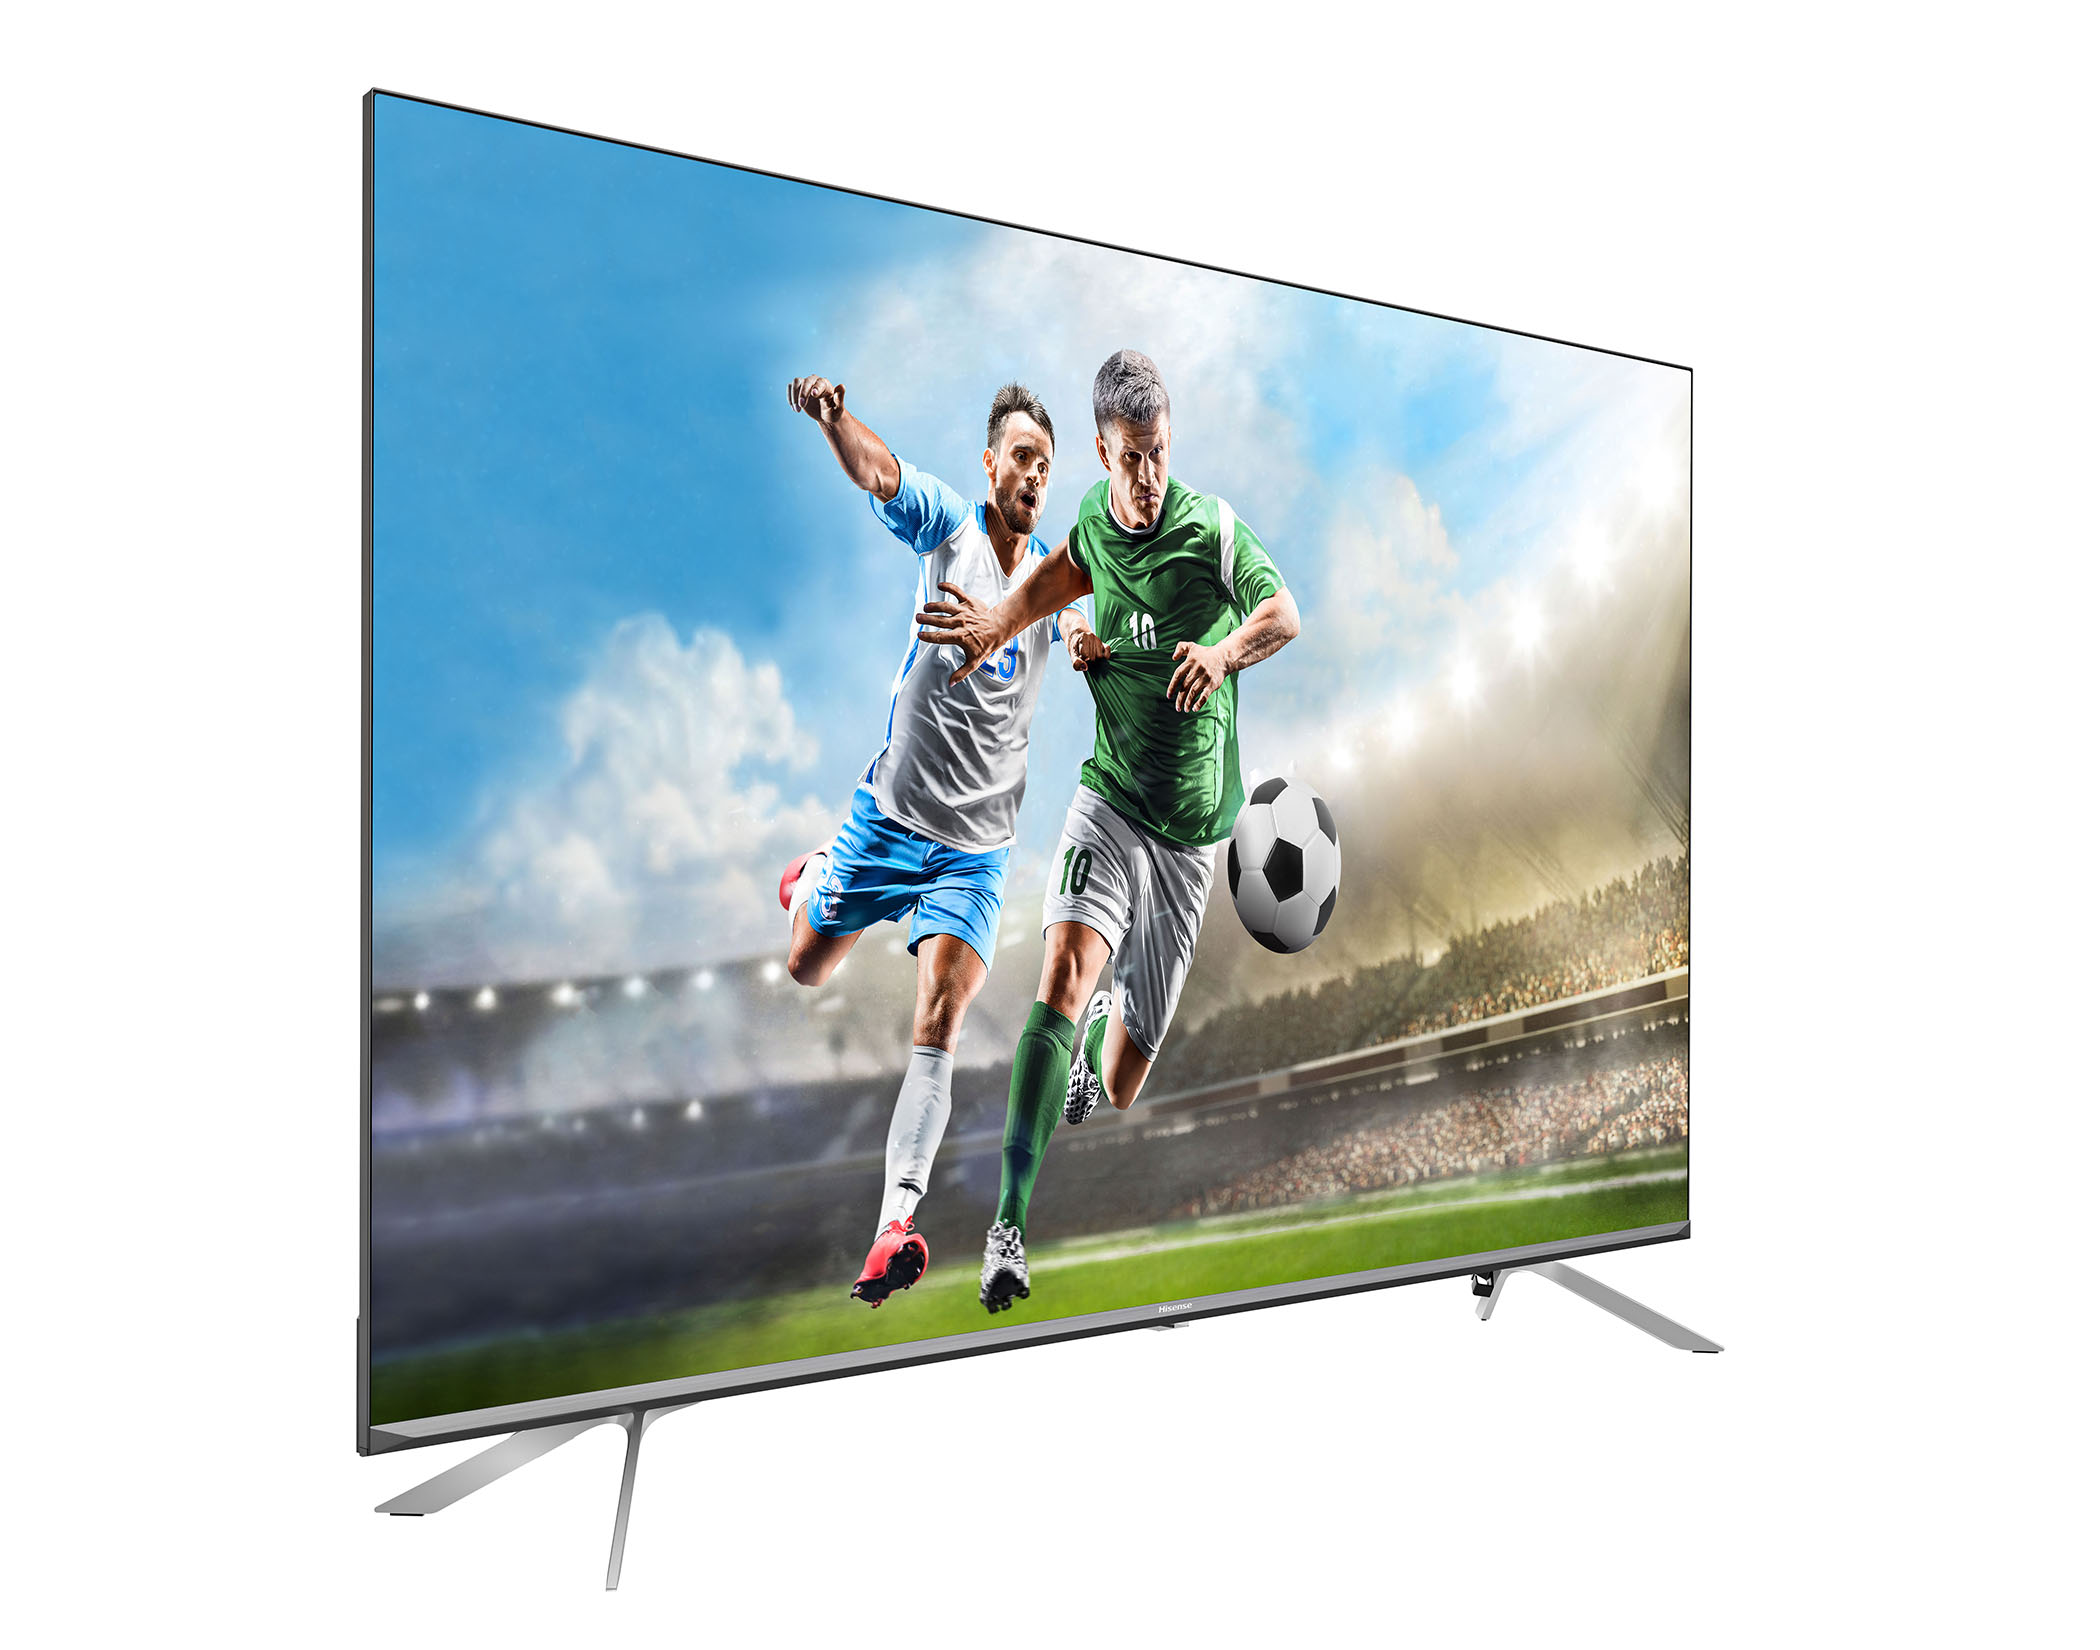 Hisense 50S8 55S8 65S8 UHD 4K TV SERIES 8 main